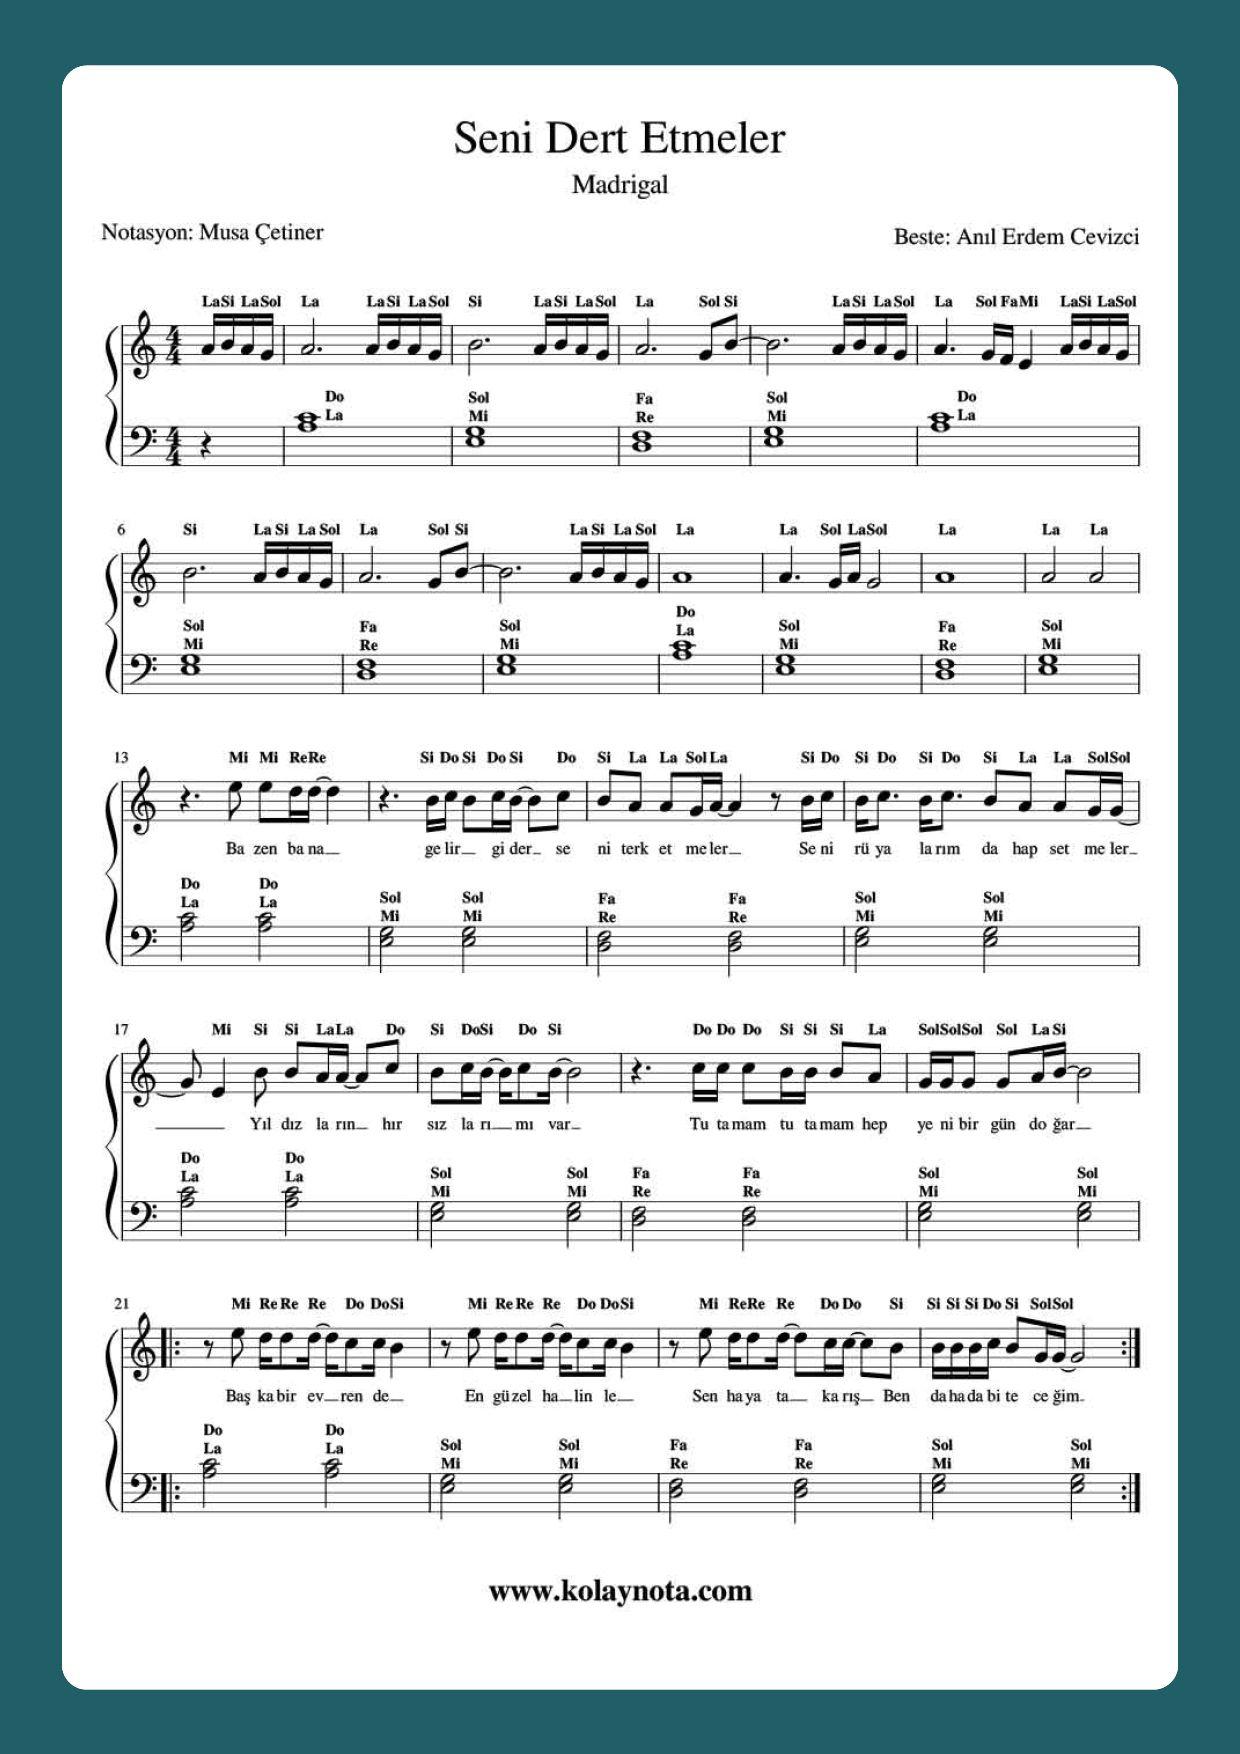 Seni Dert Etmeler Piyano Notalara Dokulmus Muzik Piyano Muzik Notalari